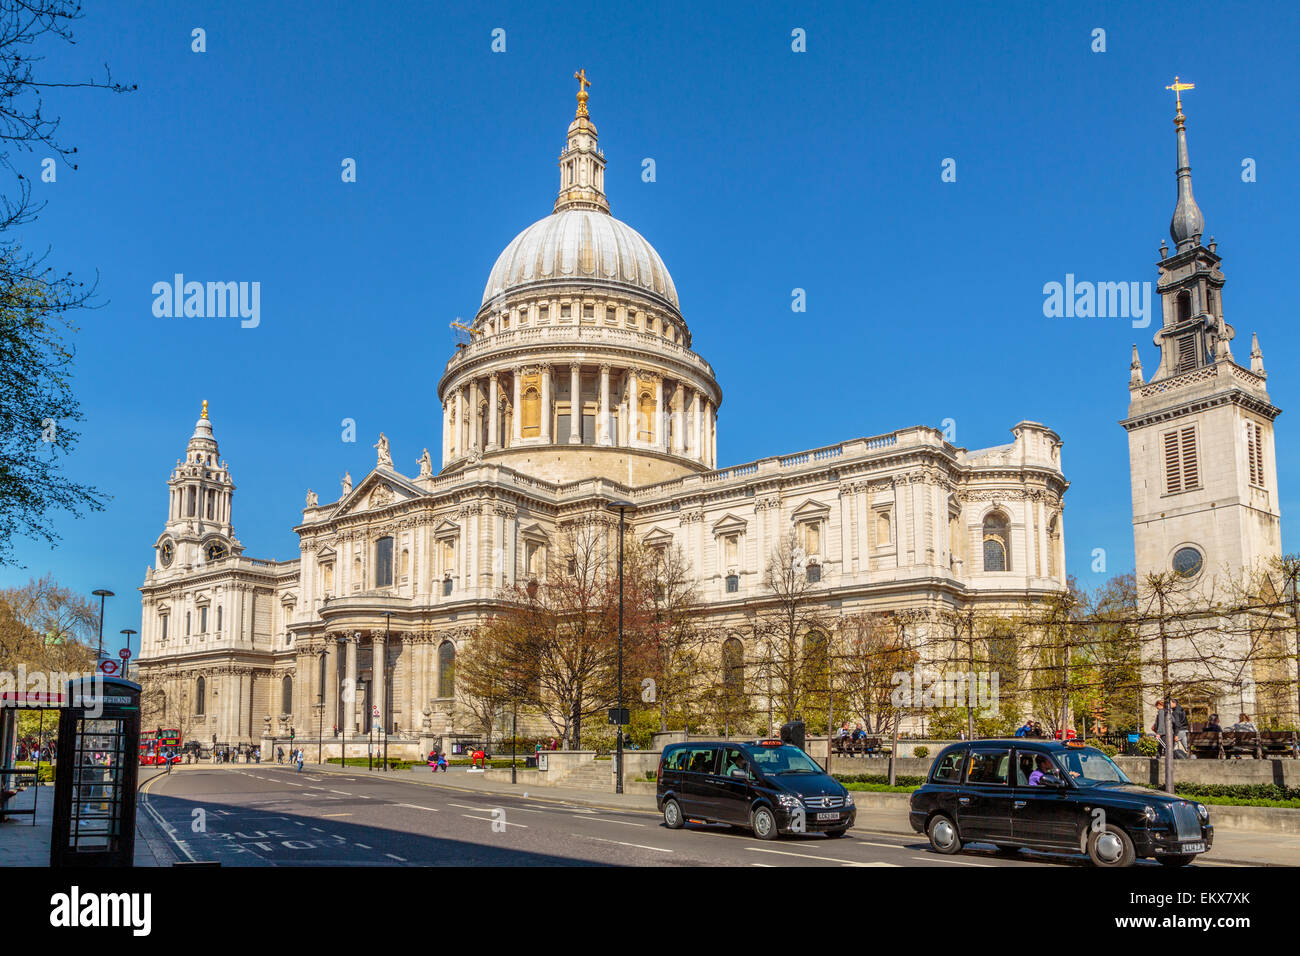 Die St Paul's Kathedrale an einem klaren Frühlingstag in London England Großbritannien Stockbild